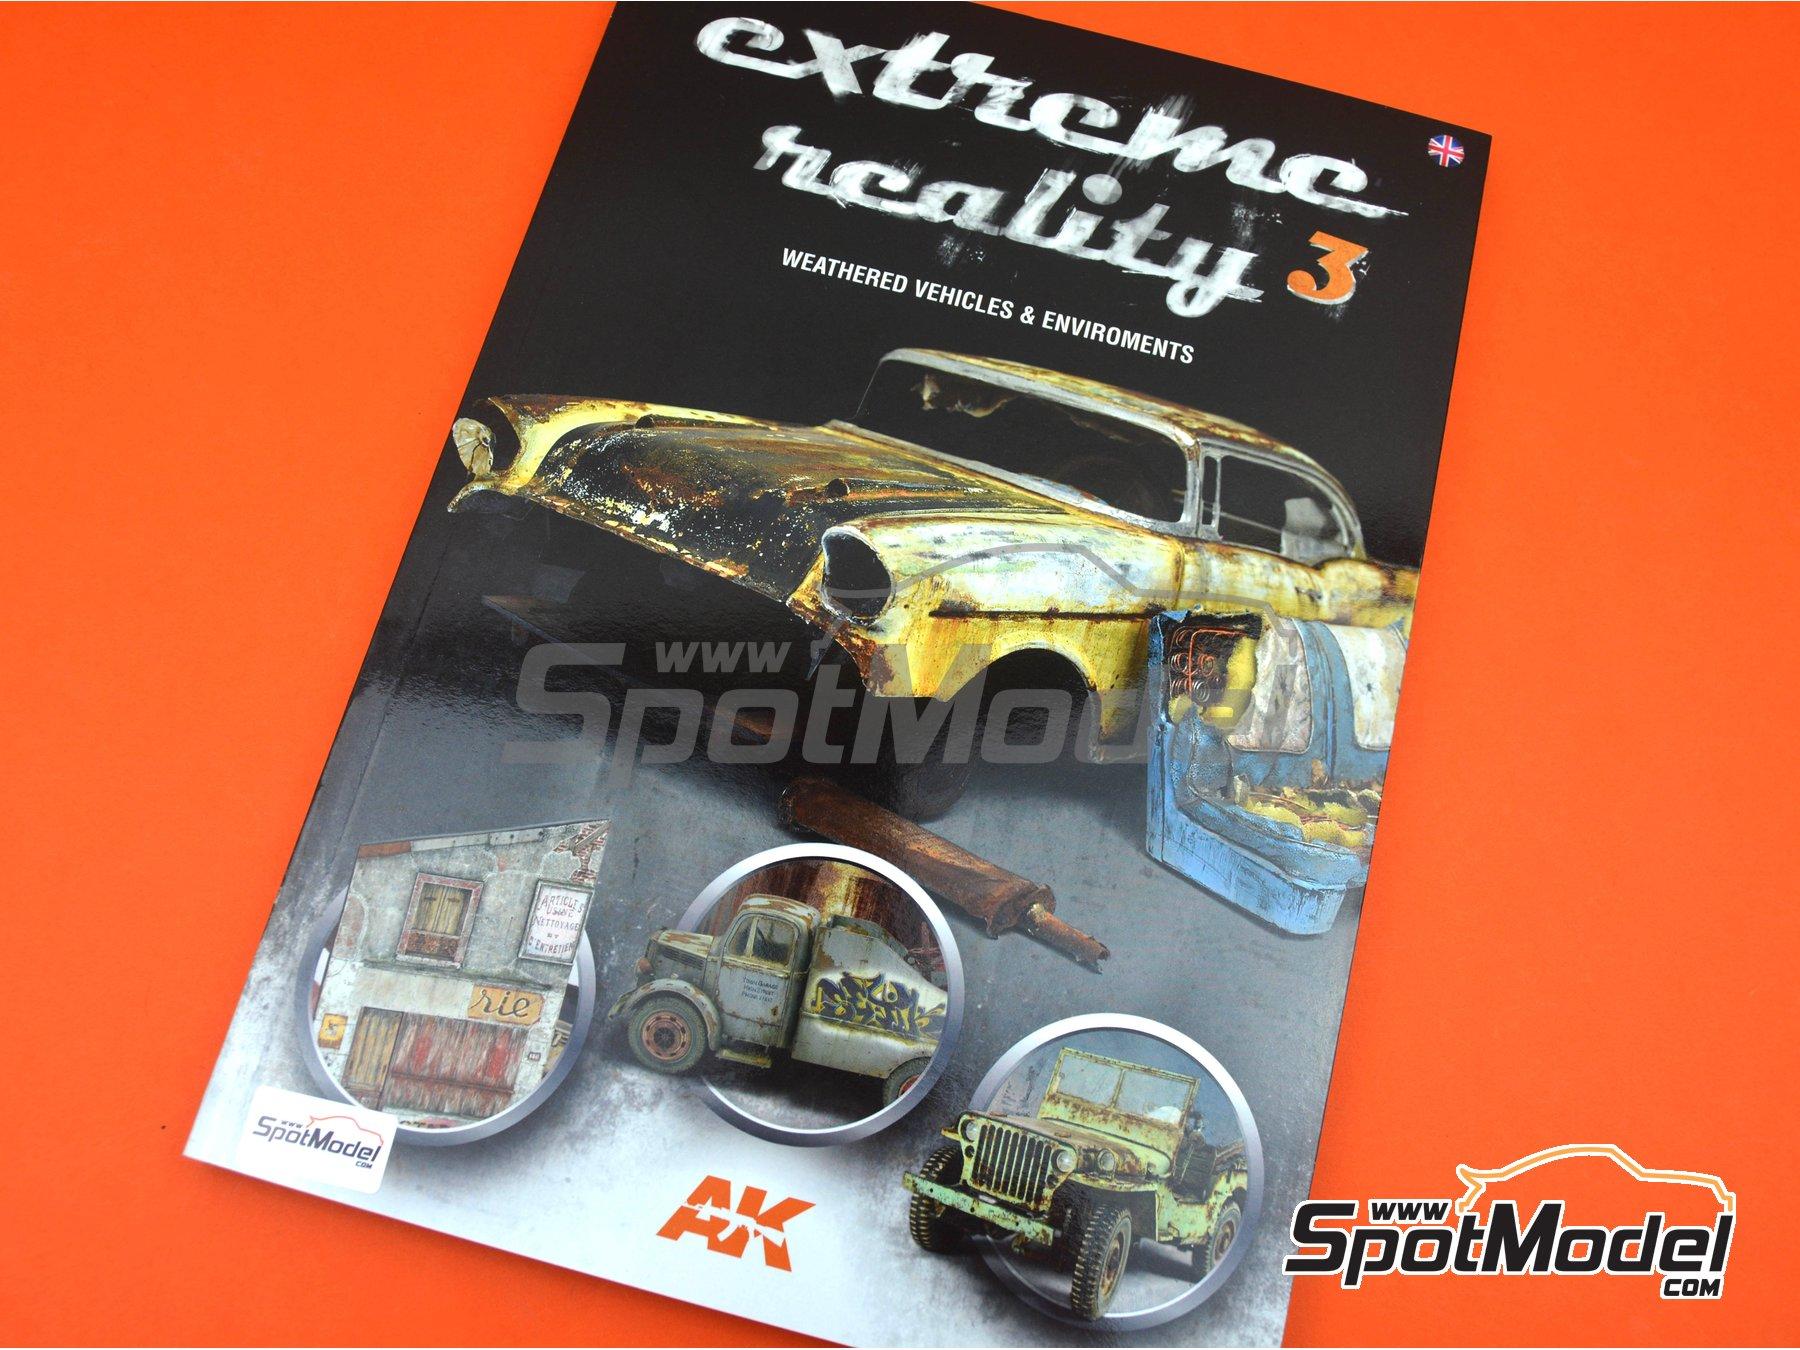 Image 7: Extreme Reality 3 -Weathered vehicles and environments | Libro fabricado por AK Interactive (ref.AK-510)